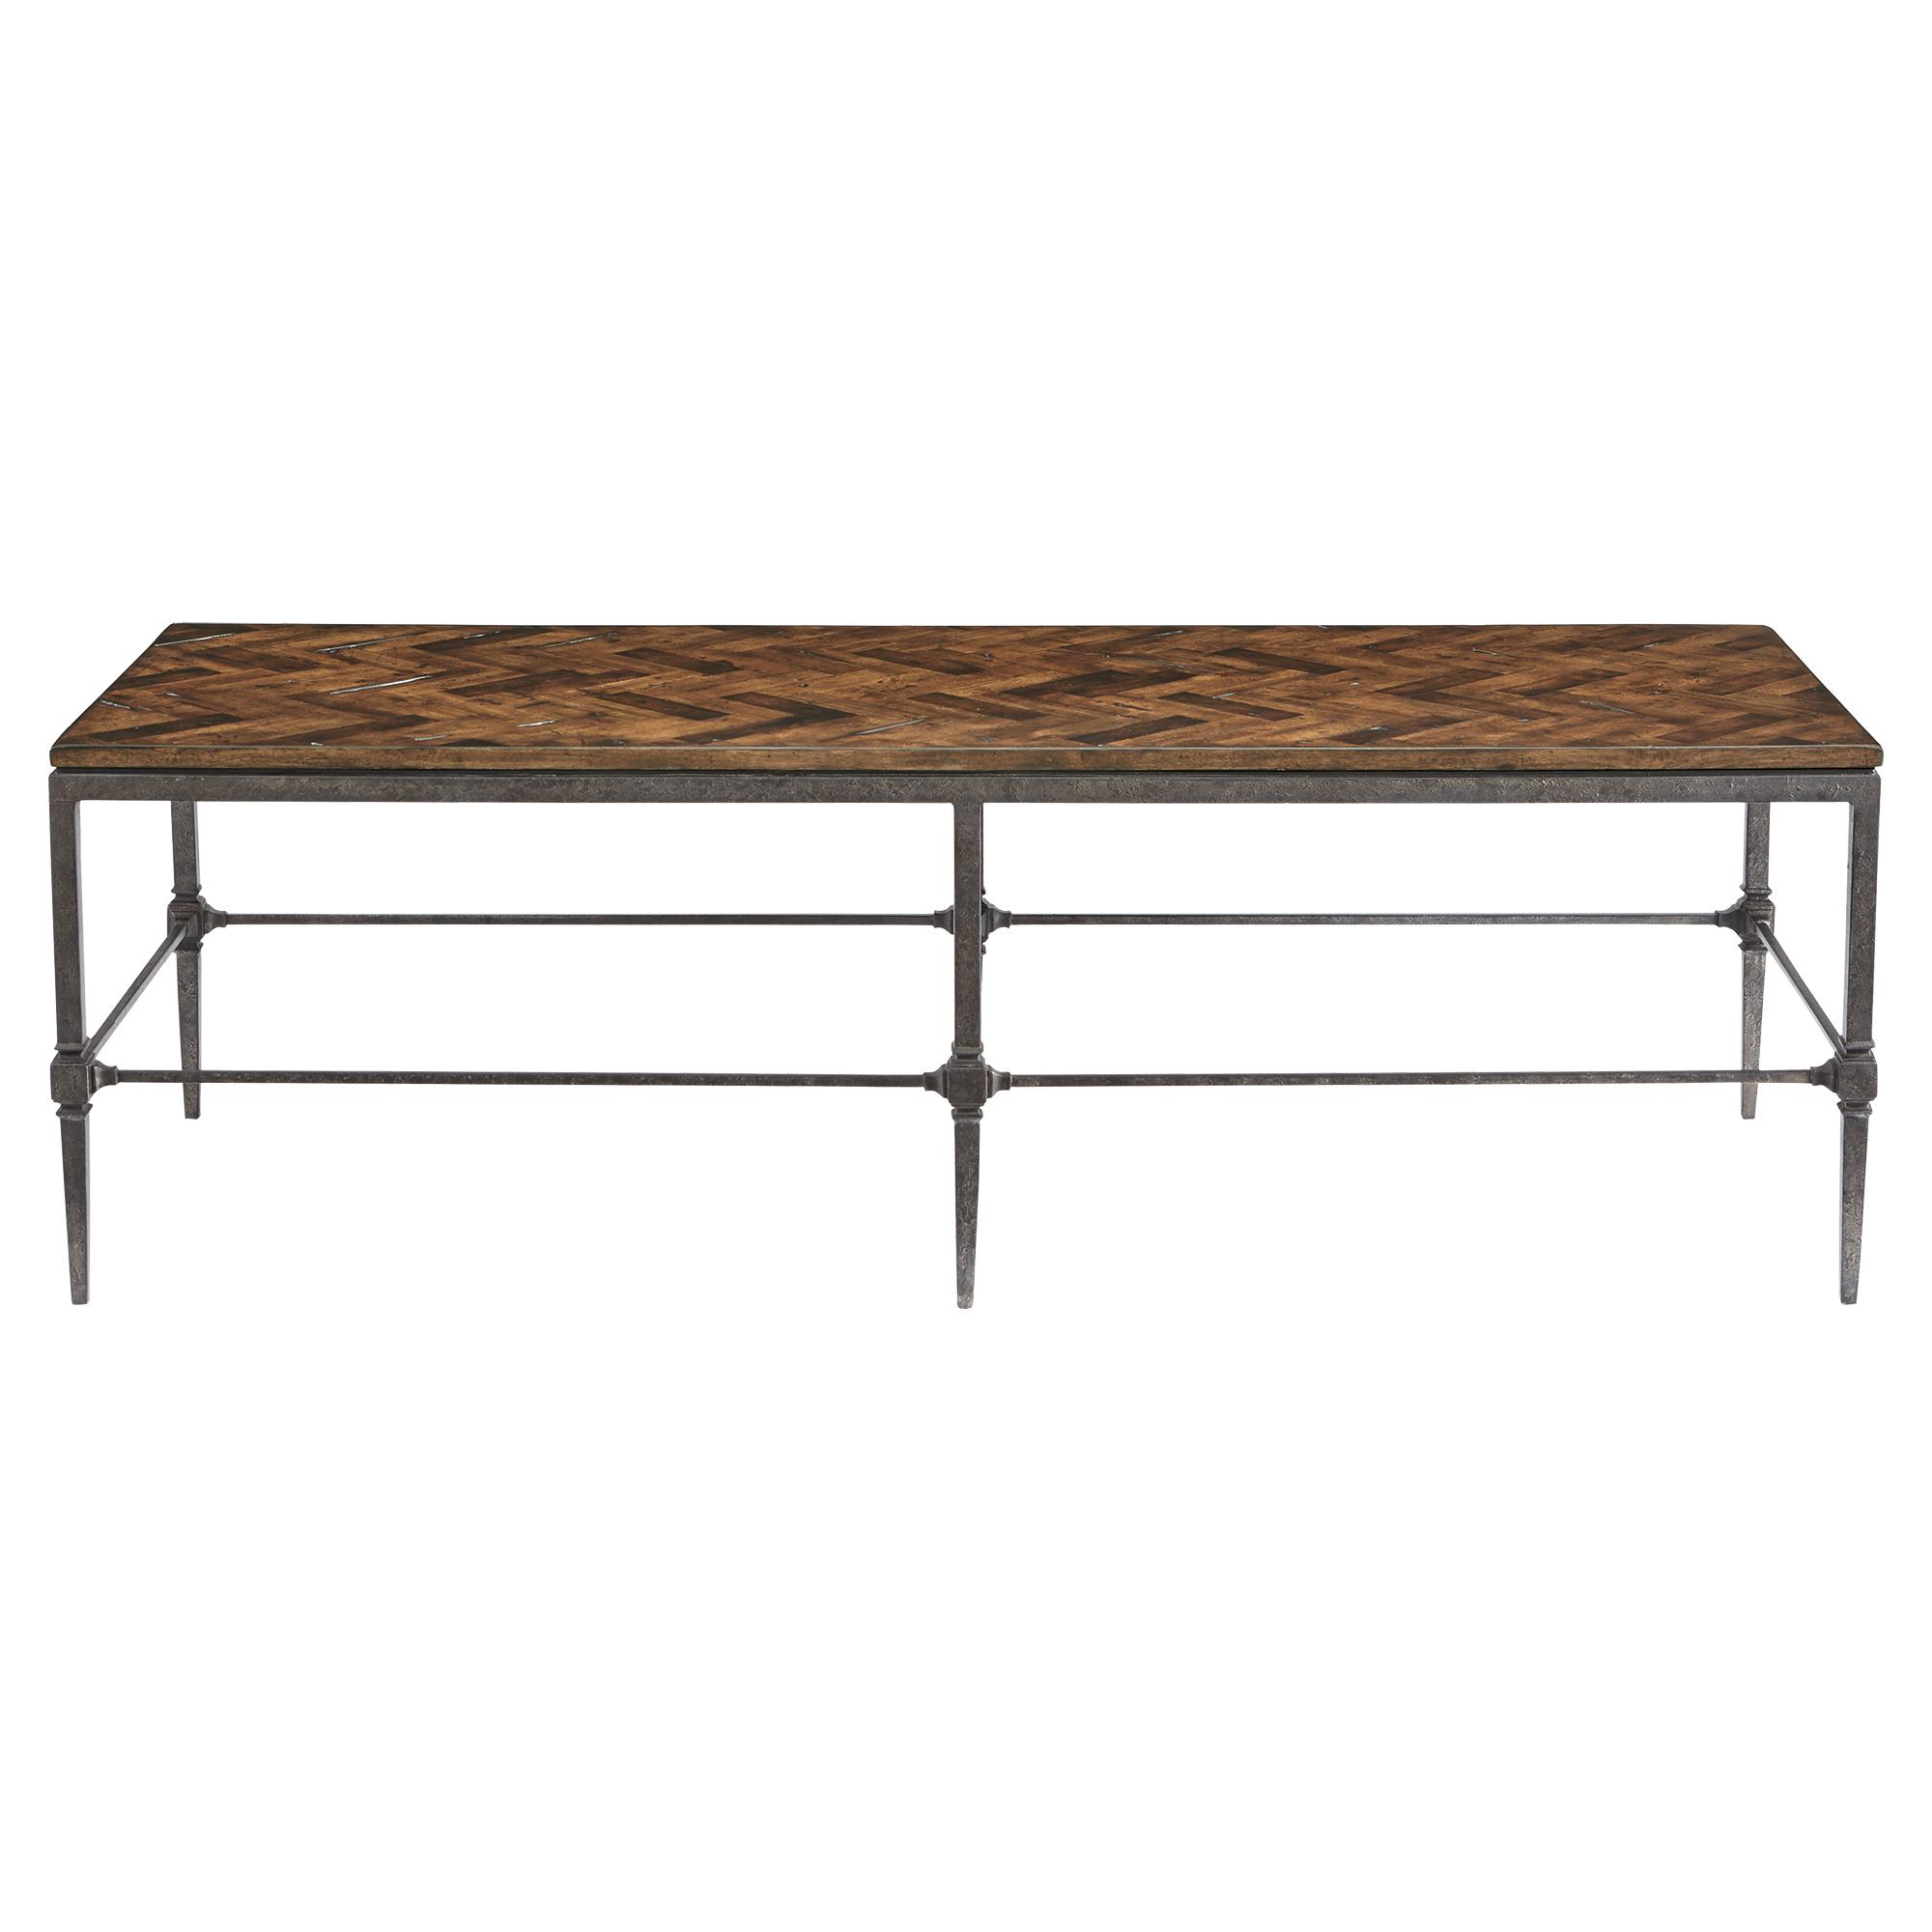 Doyle Lodge Herringbone Wood Blackened Steel Coffee Table